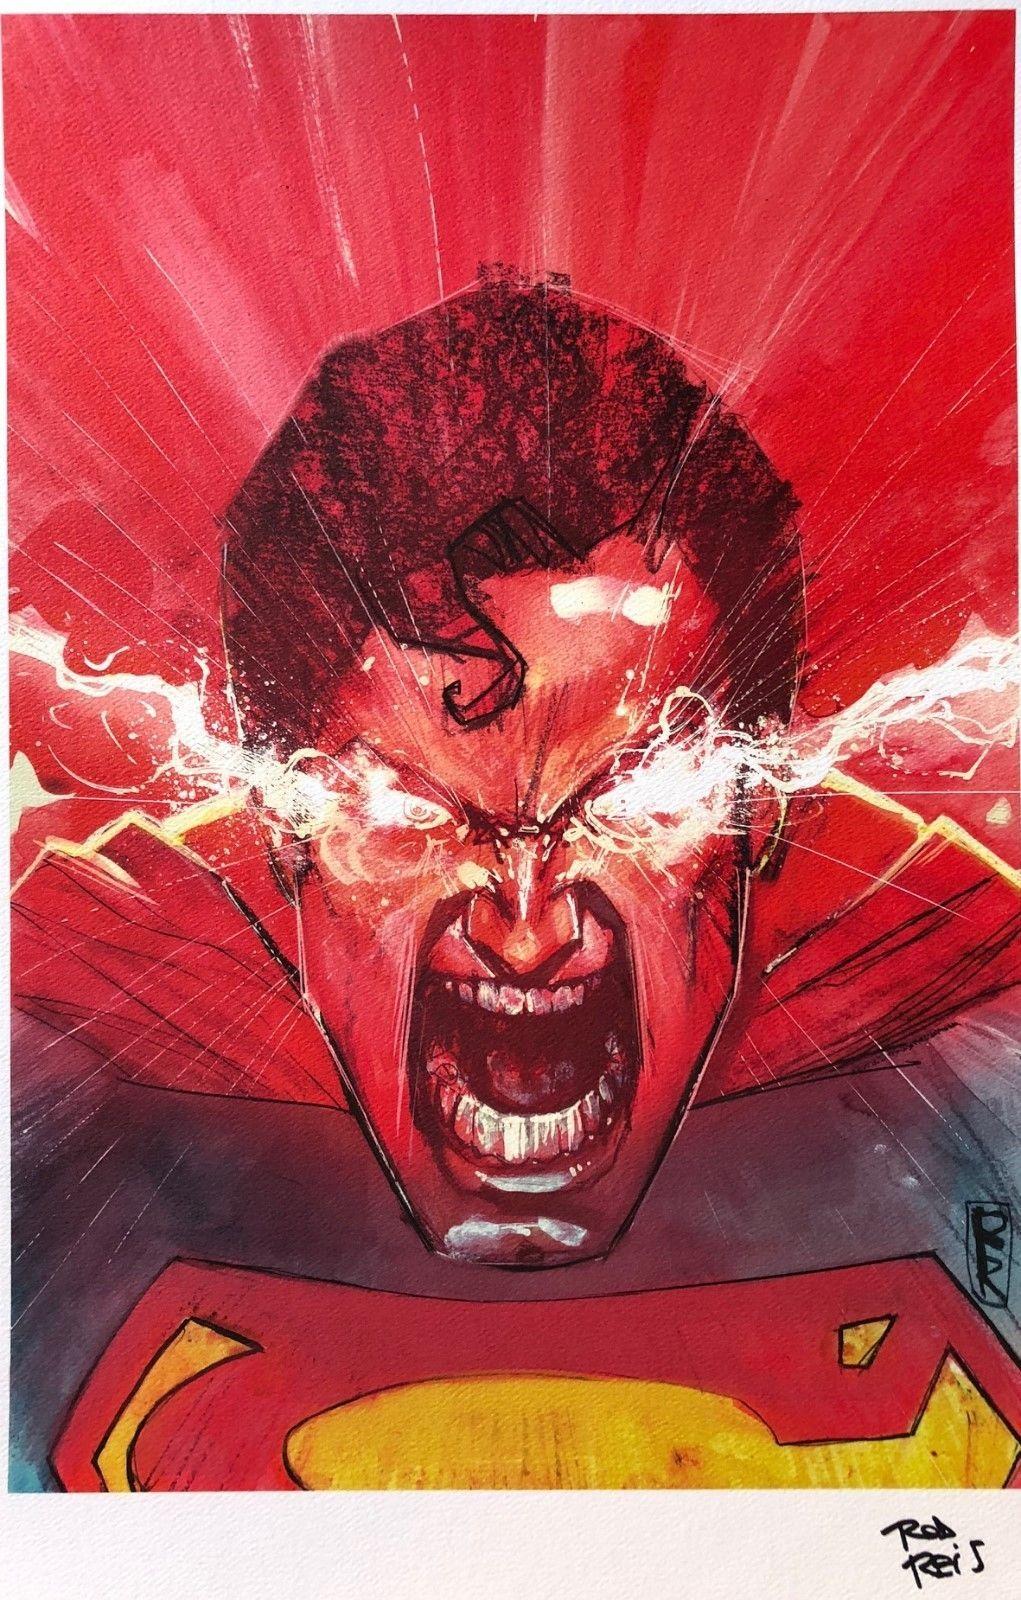 Rod Reis Rare Superman Print Signed Limited Dc Art New Last One Ebay Superhero Art Art Dc Comics Characters